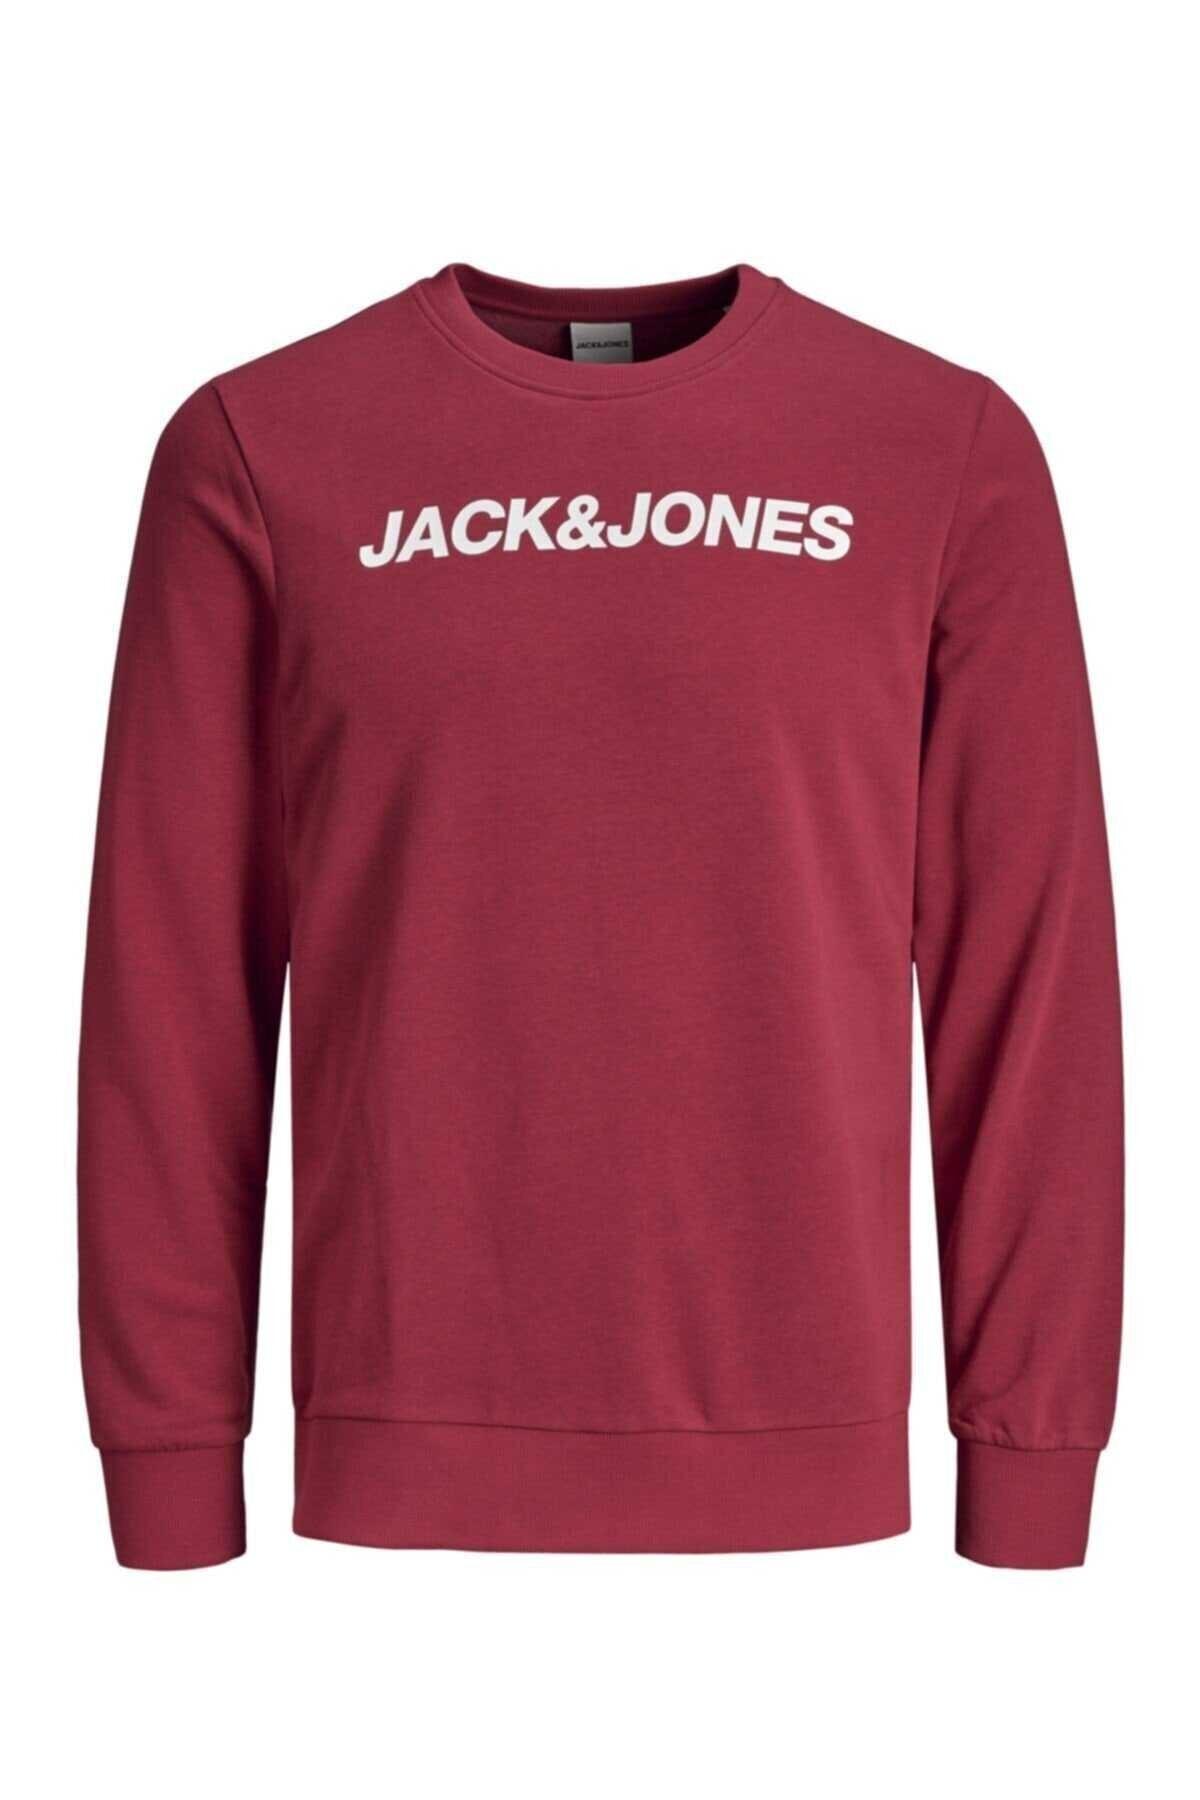 Jack & Jones Jack&jones Jcovıbe Sweat Crew Neck Erkek Sweat 121 1